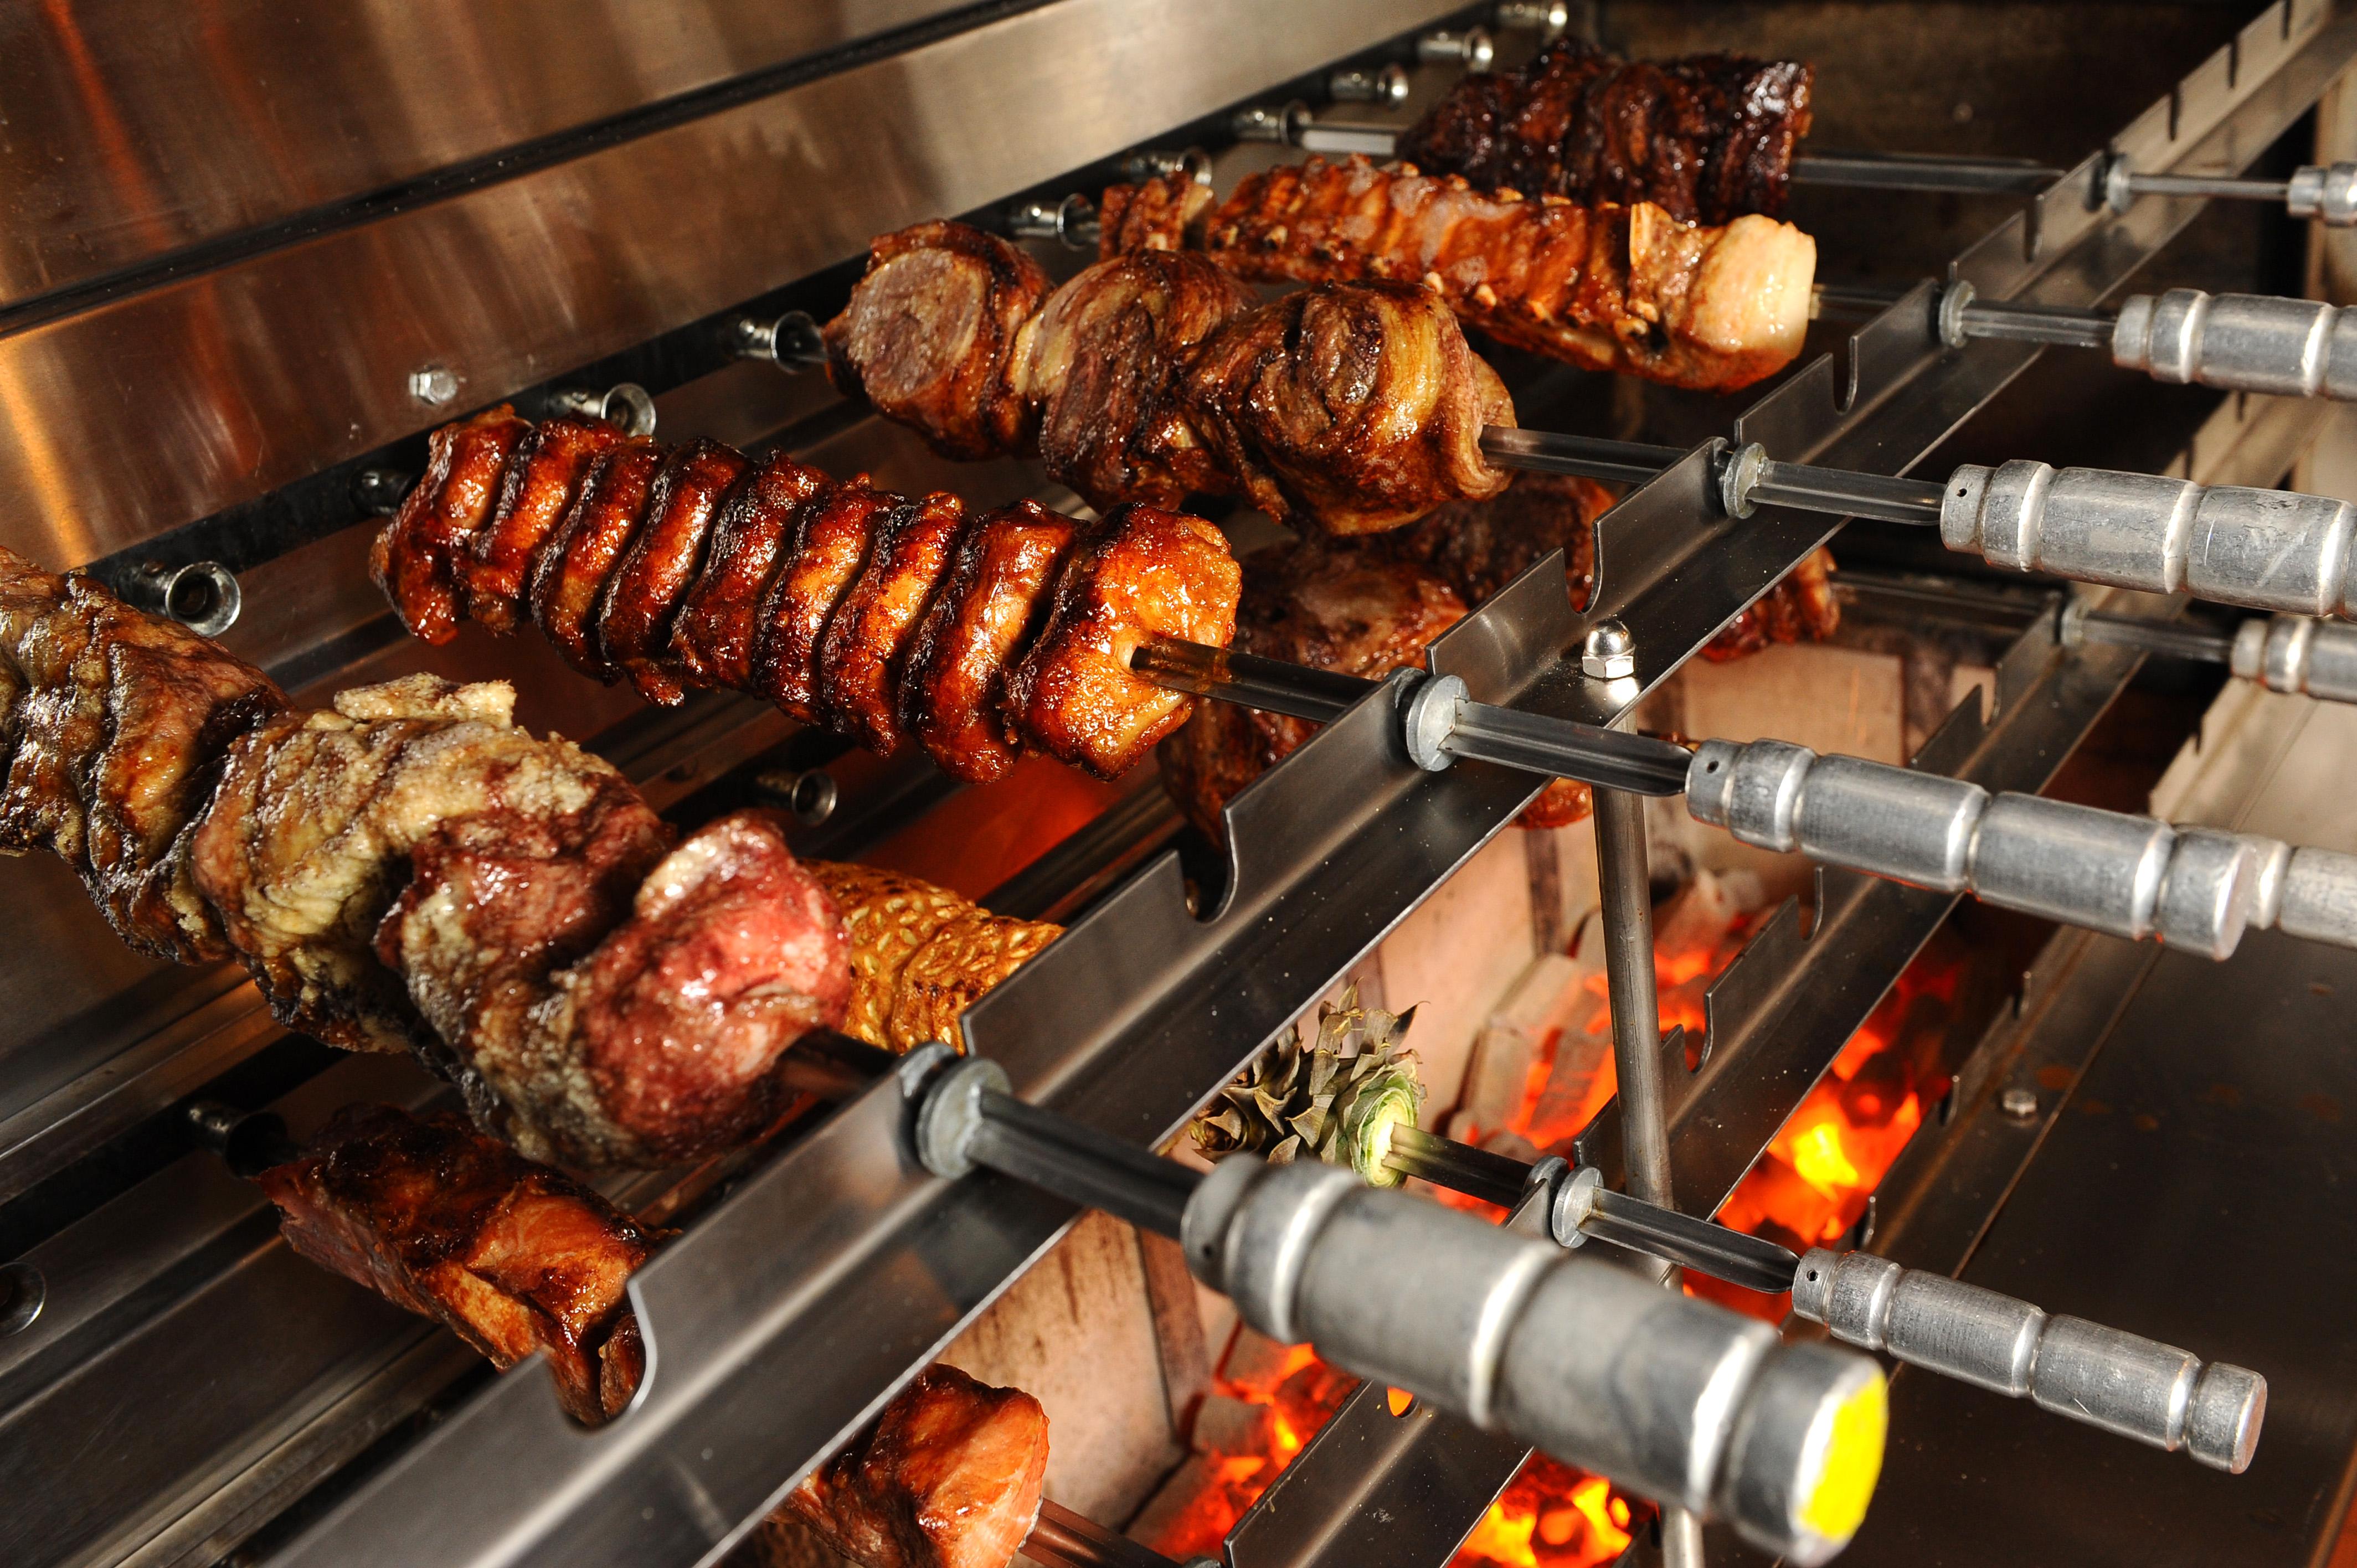 Viva Brazil restaurant, Cardiff.© WALES NEWS SERVICE